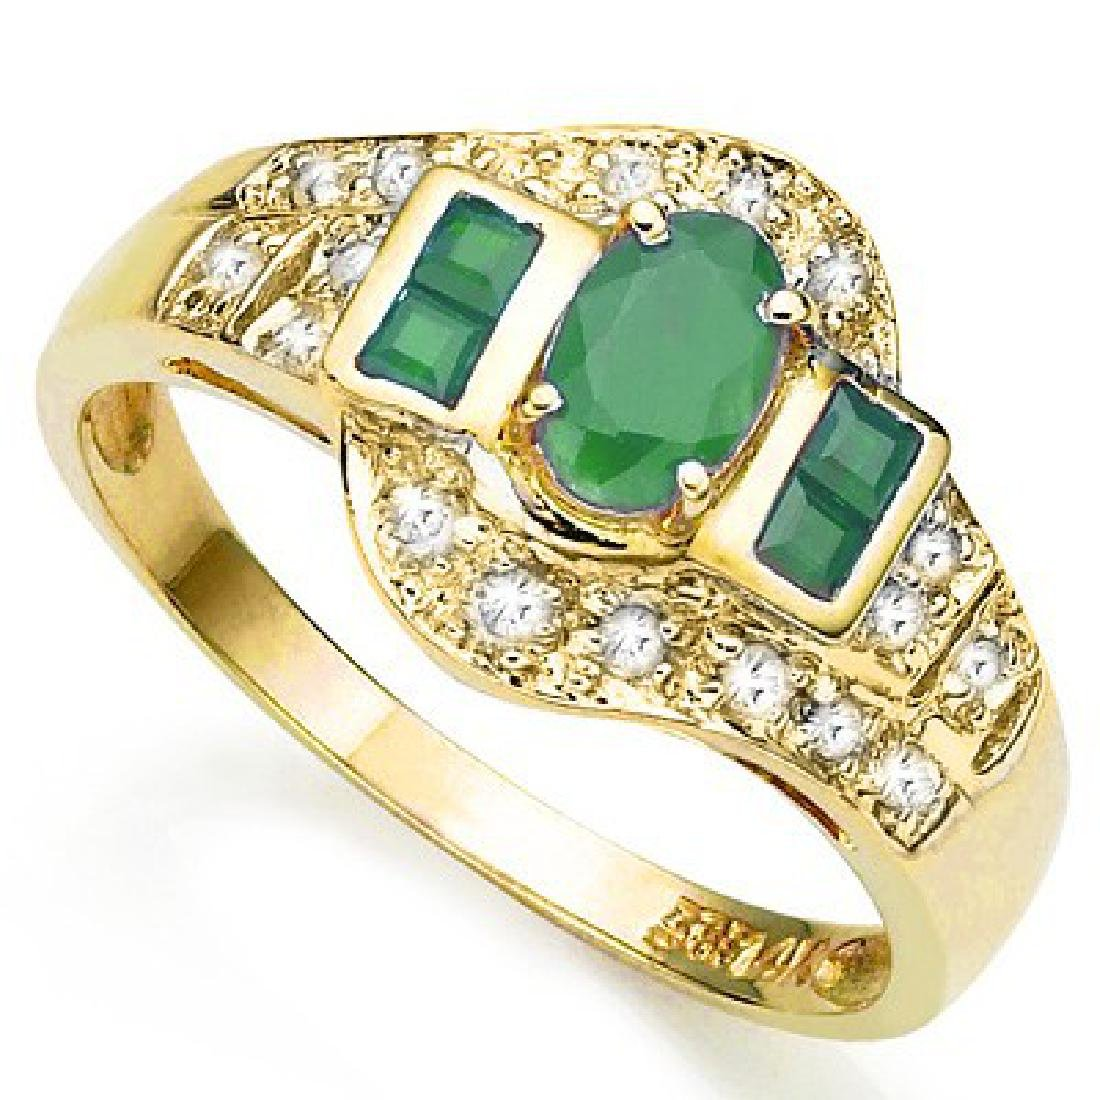 FABULOUS 10K GOLD GENUINE EMERALD/DIAMOND RING